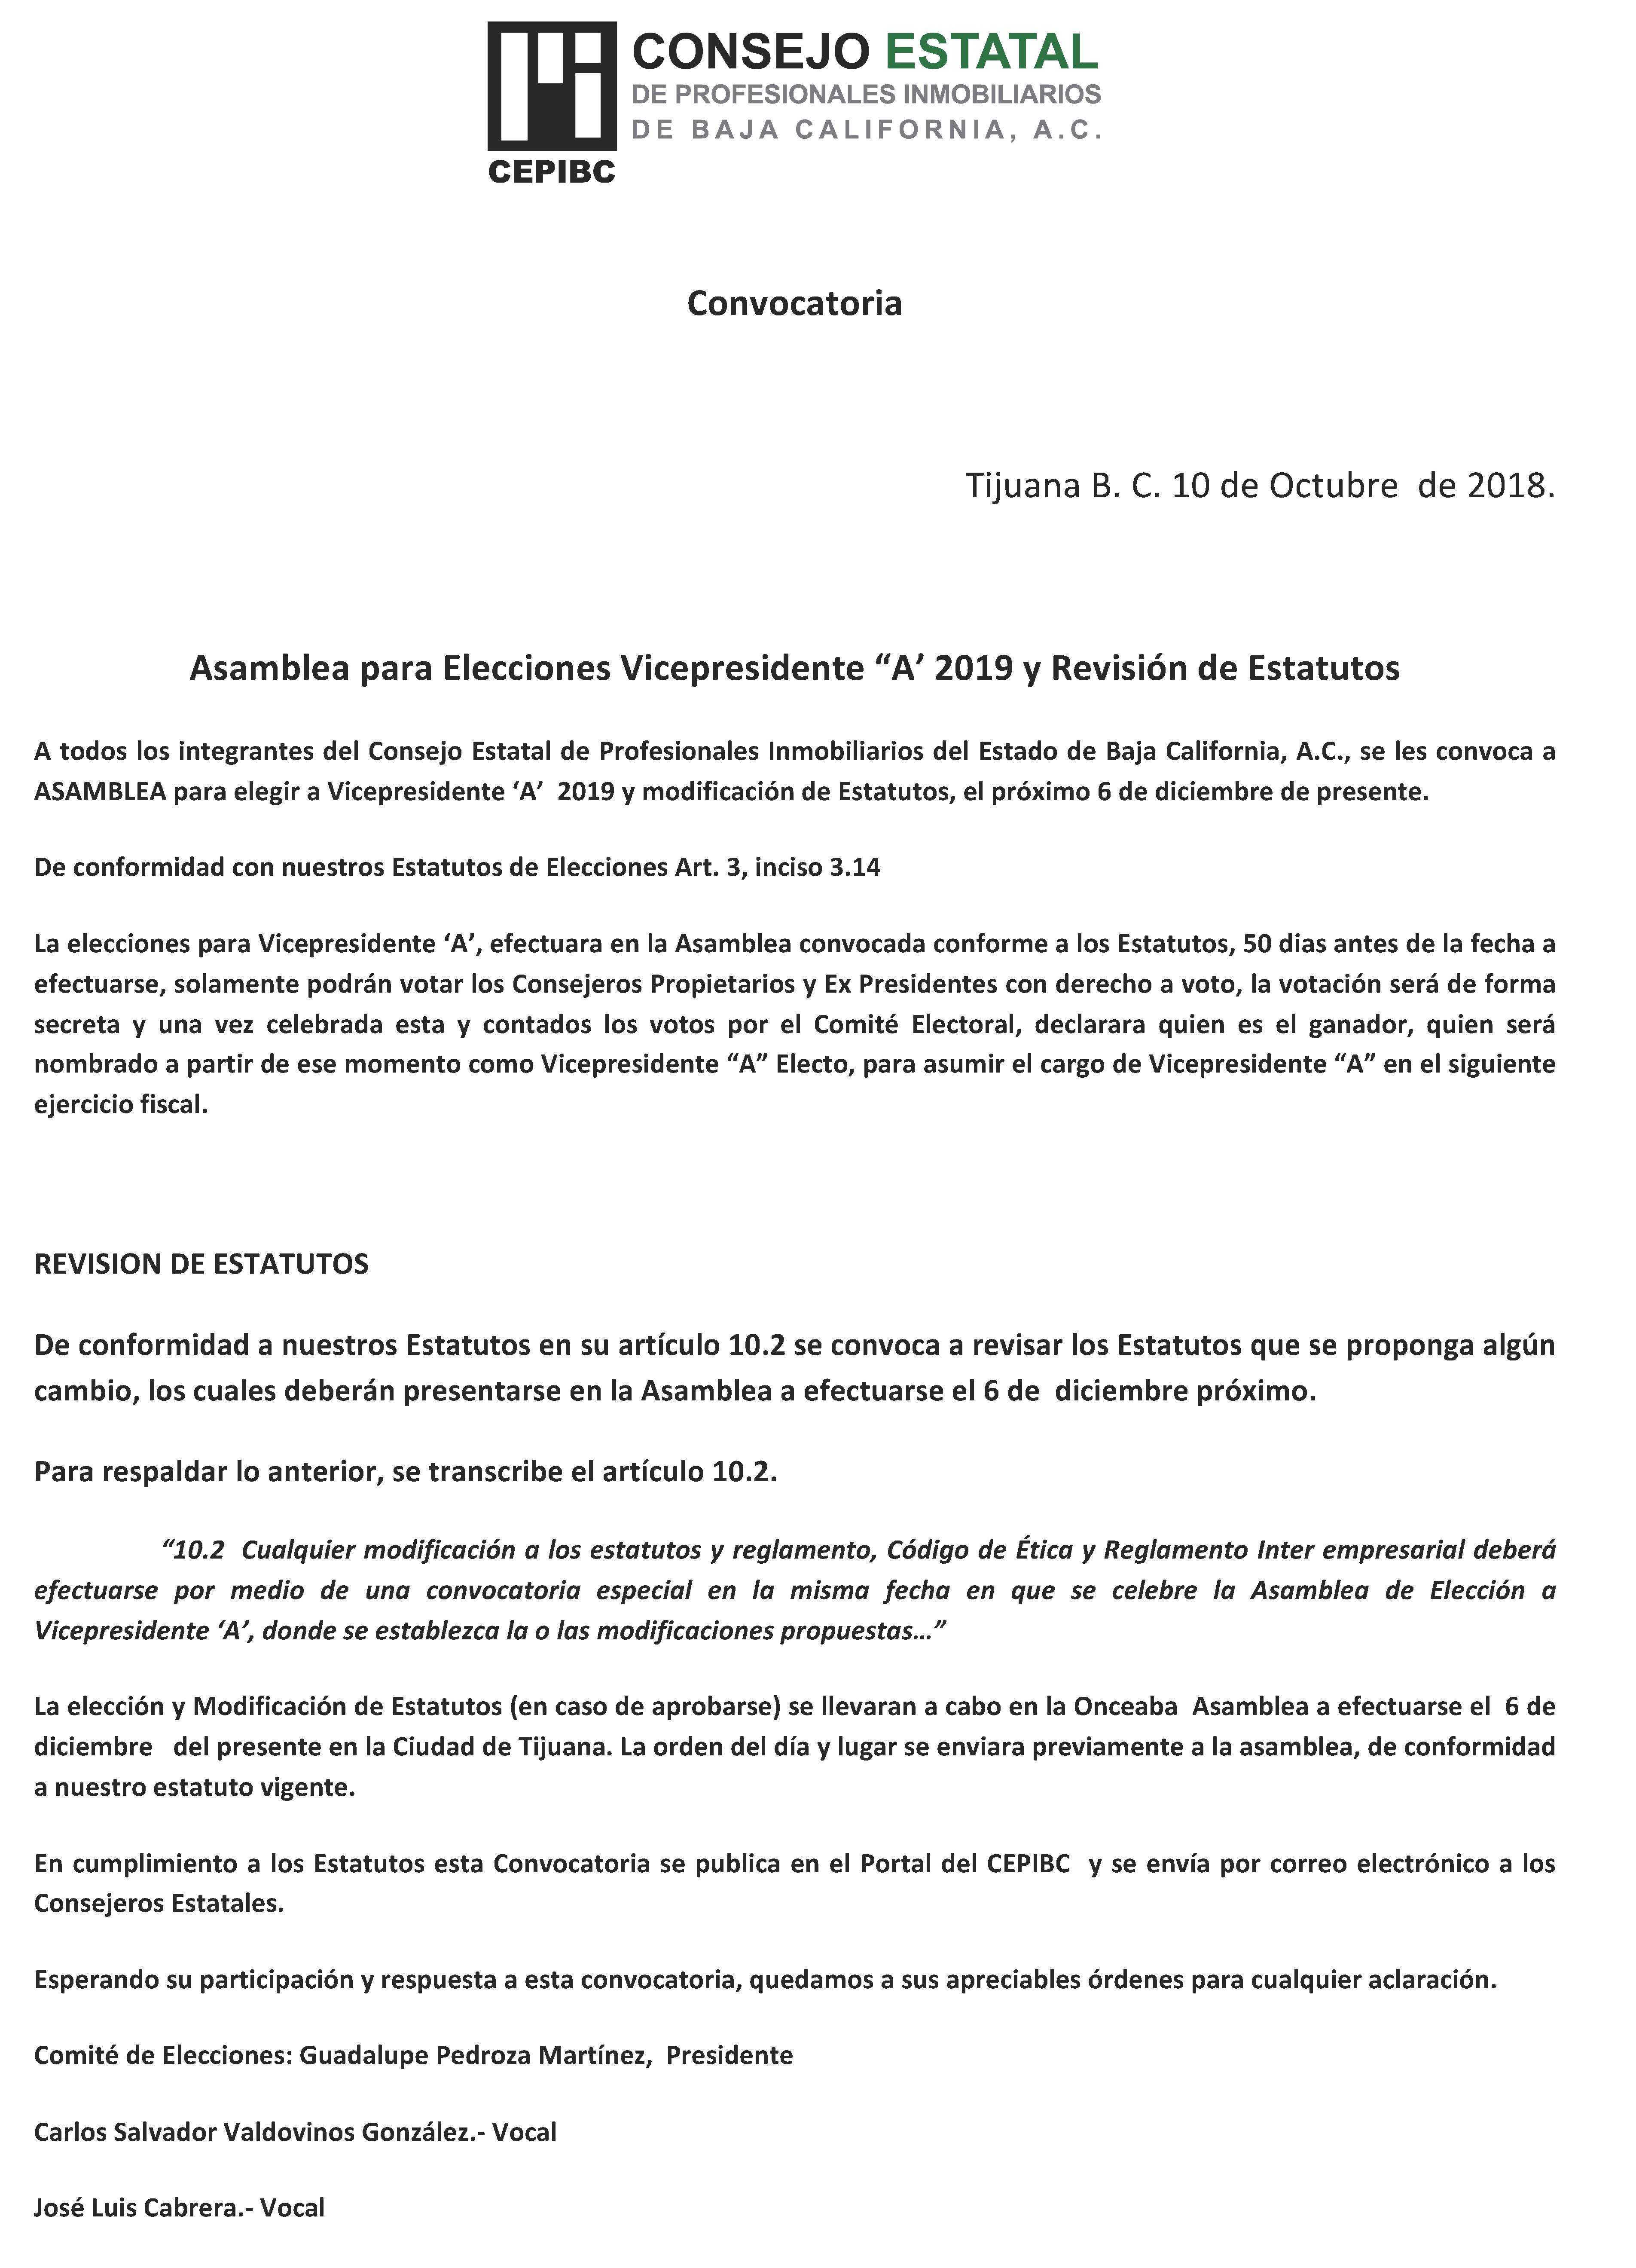 Convocatorio-Elecciones-2019